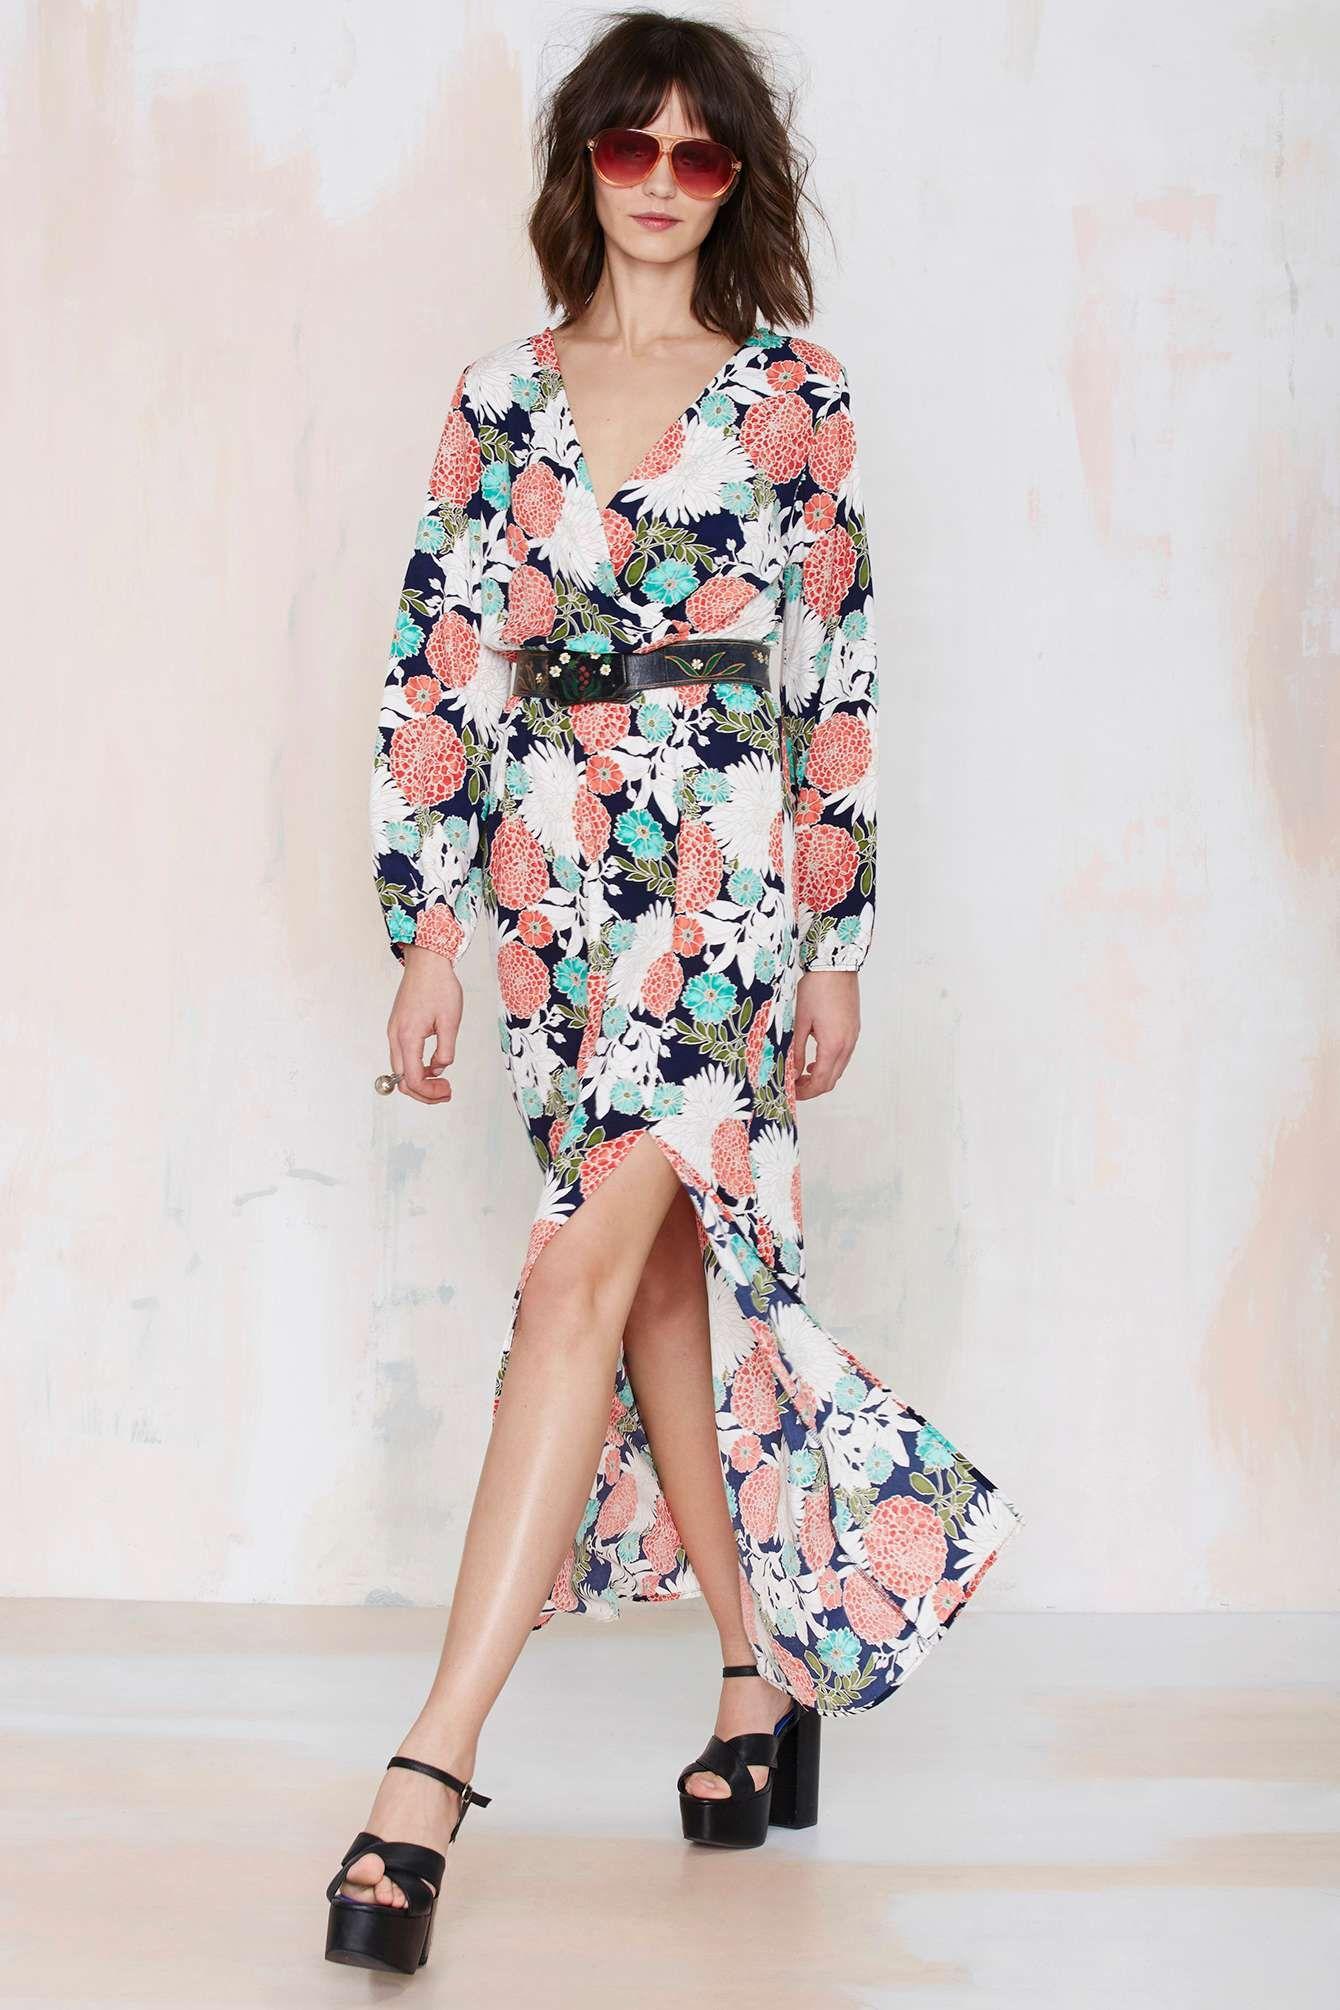 Ella floral maxi dress with thighhigh slit looks pinterest